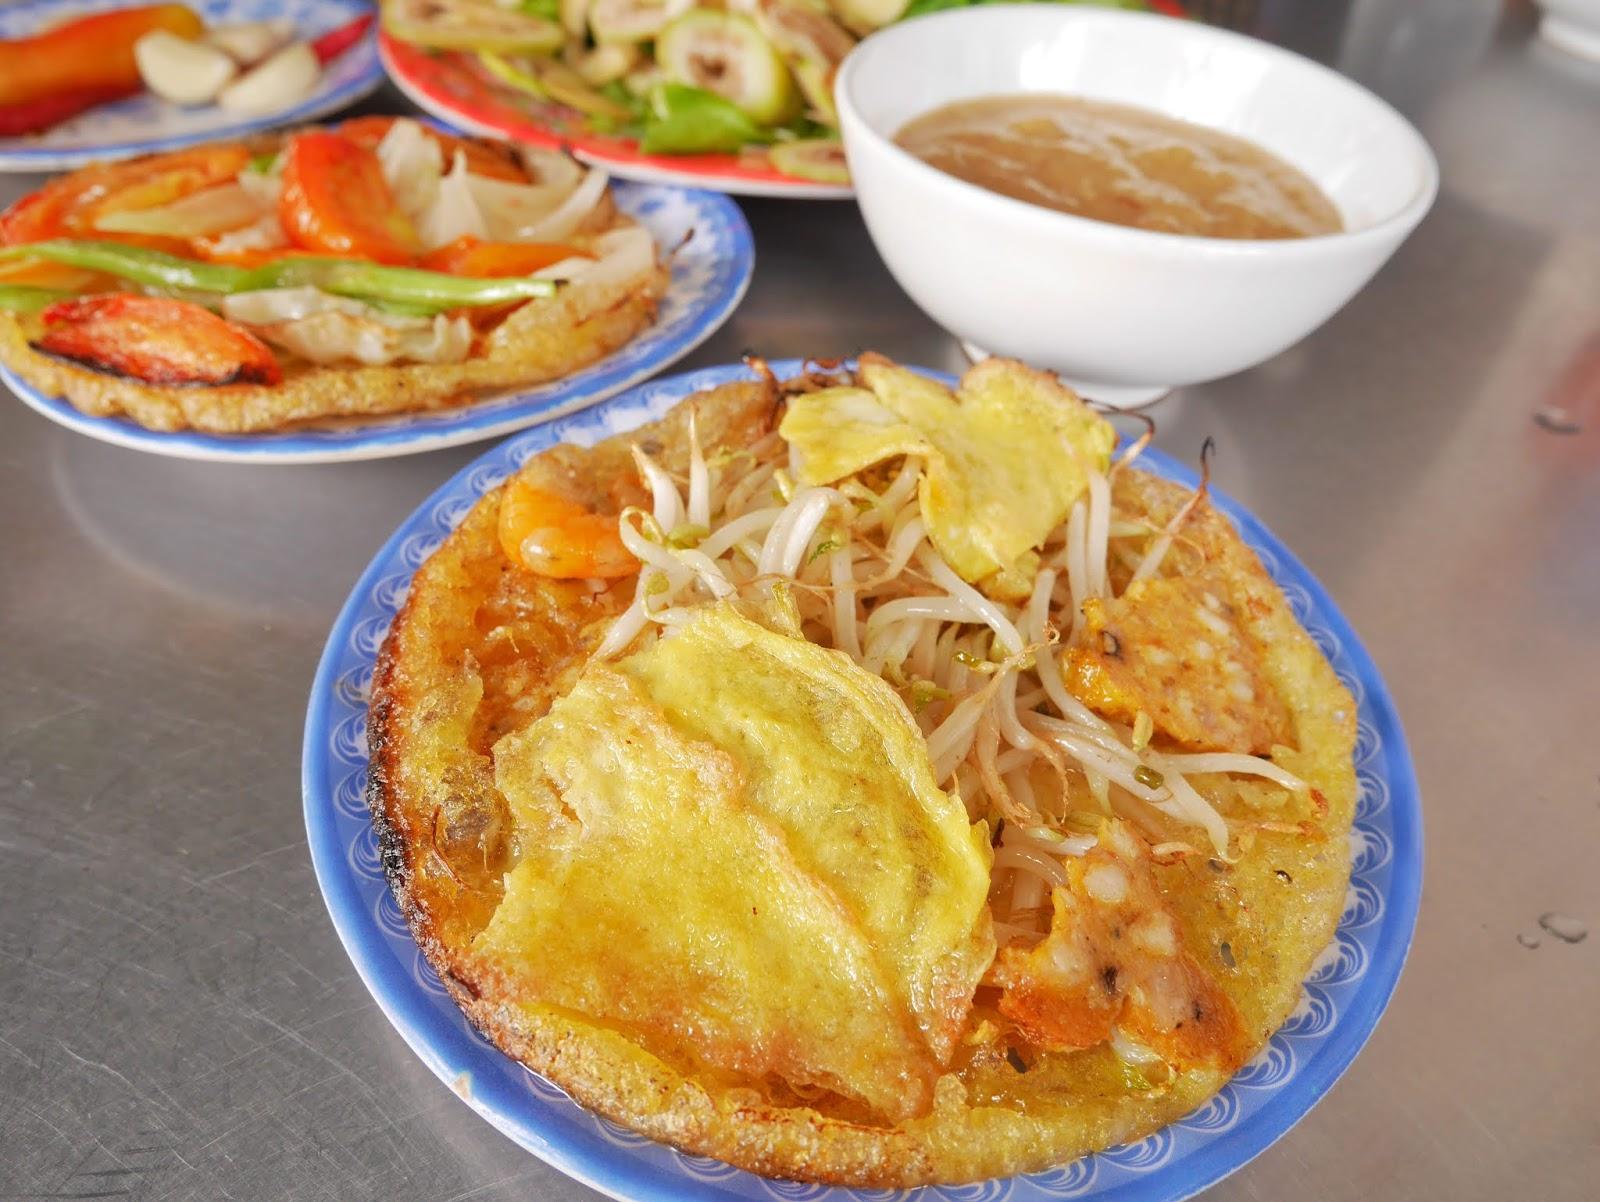 Impressive  Bánh khoái by Lac Thanh, Imperial City Hue, Vietnam